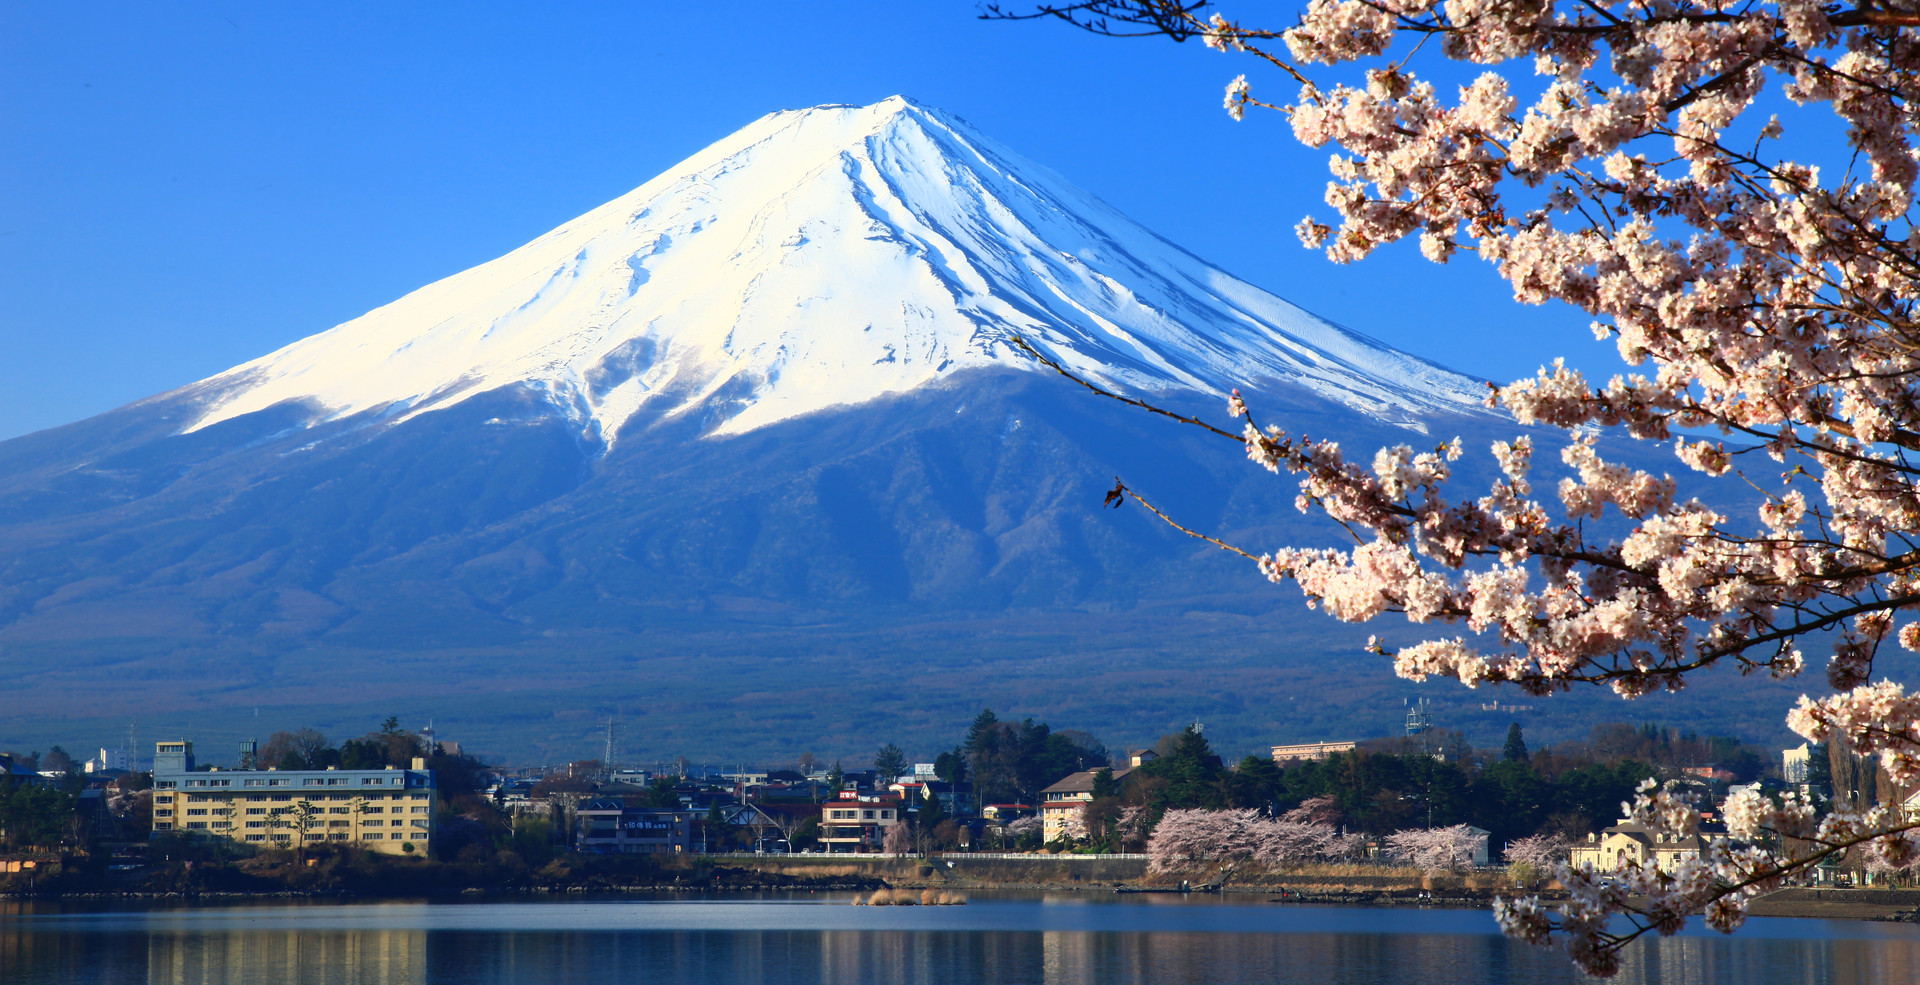 monte_fuji_japao.jpg